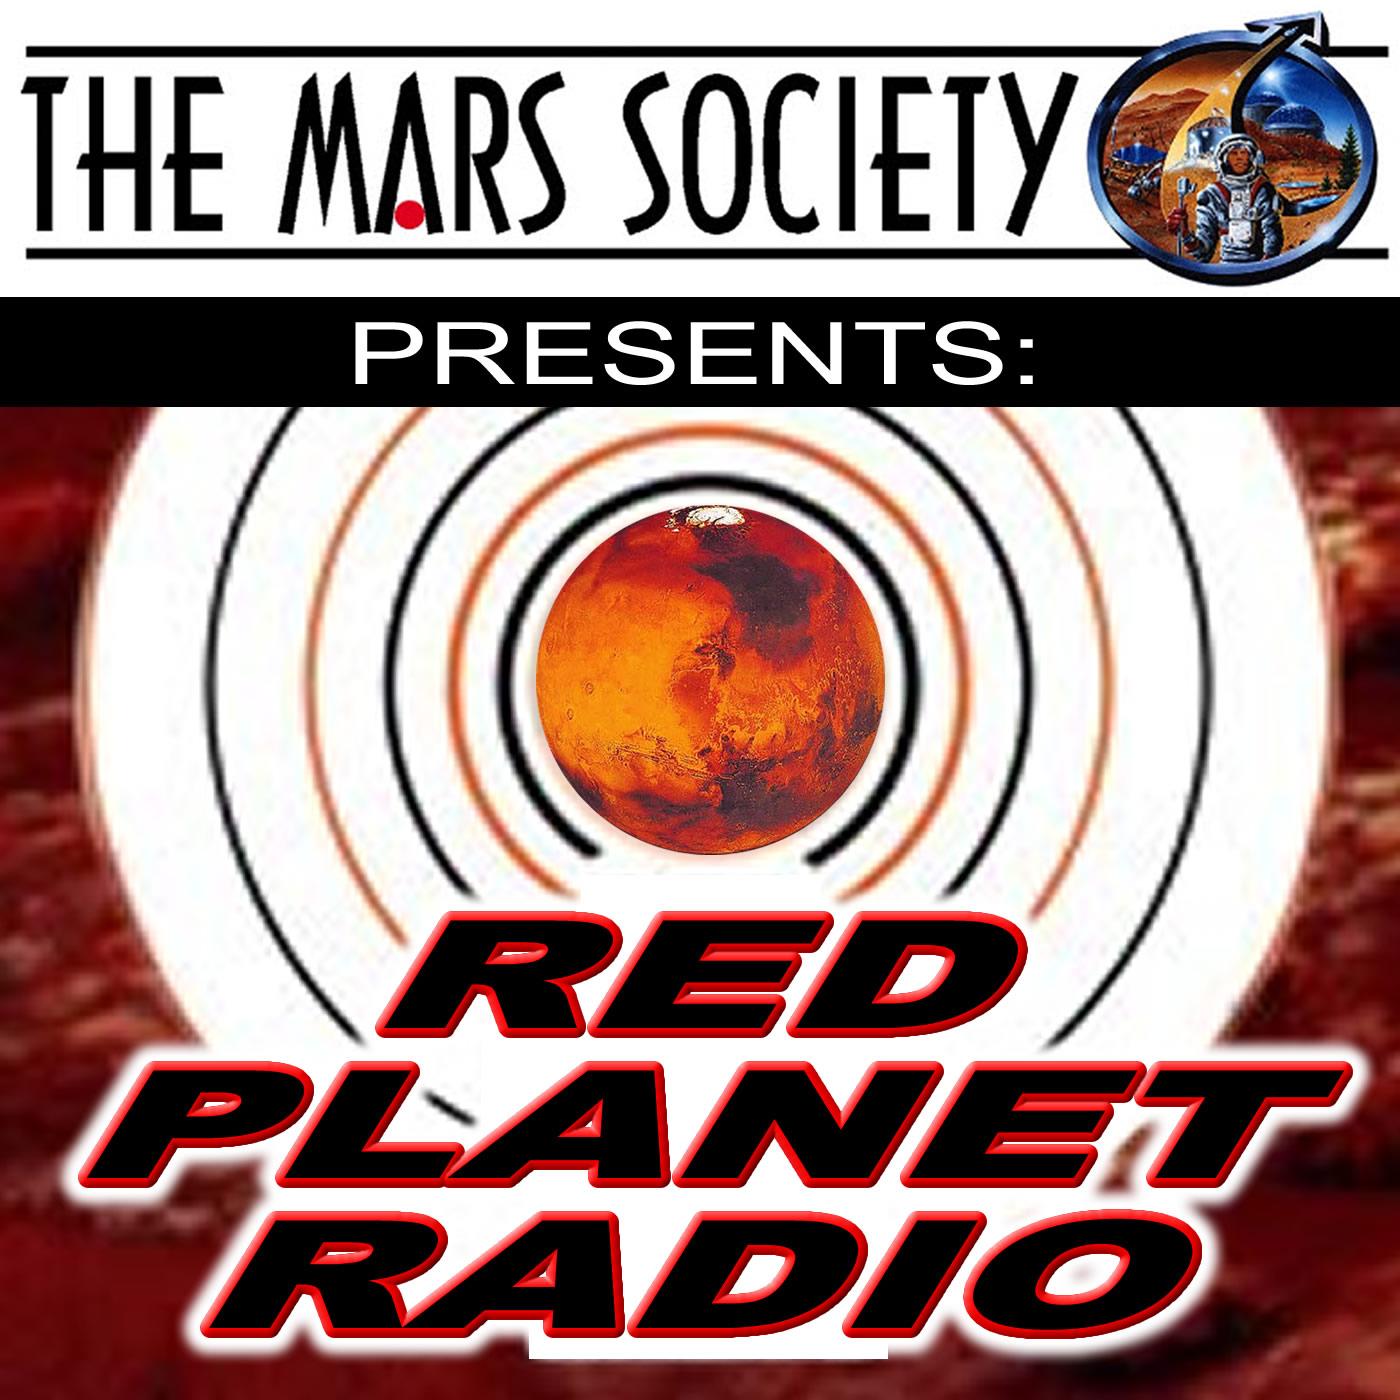 Red Planet Radio show art